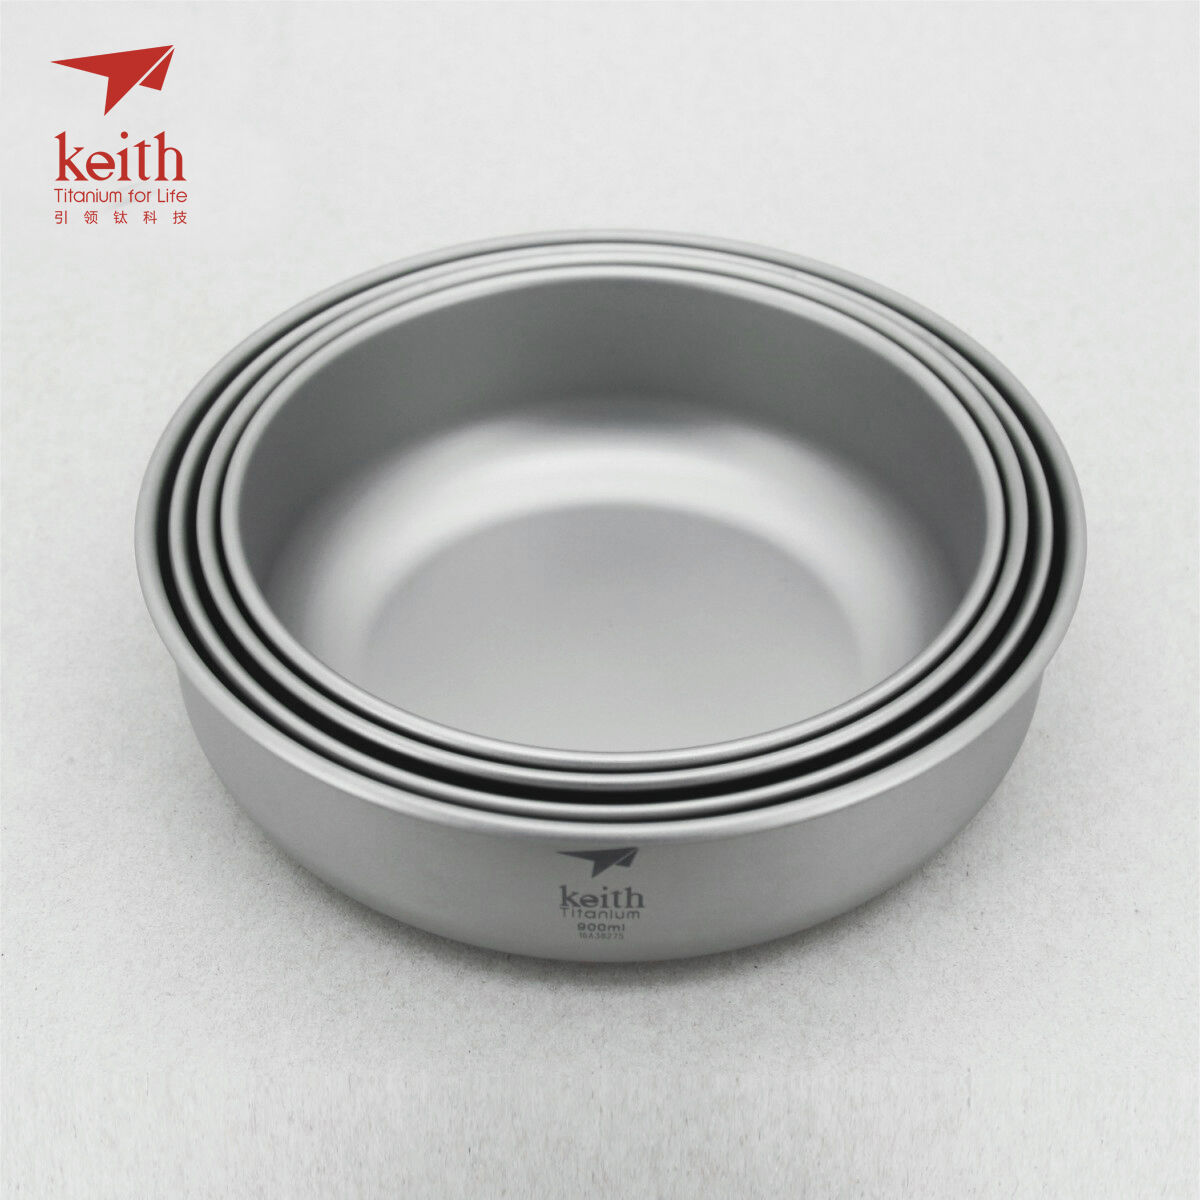 Keith Titanium Ti5376 4-Piece Bowl Set (Shipped from California, USA)